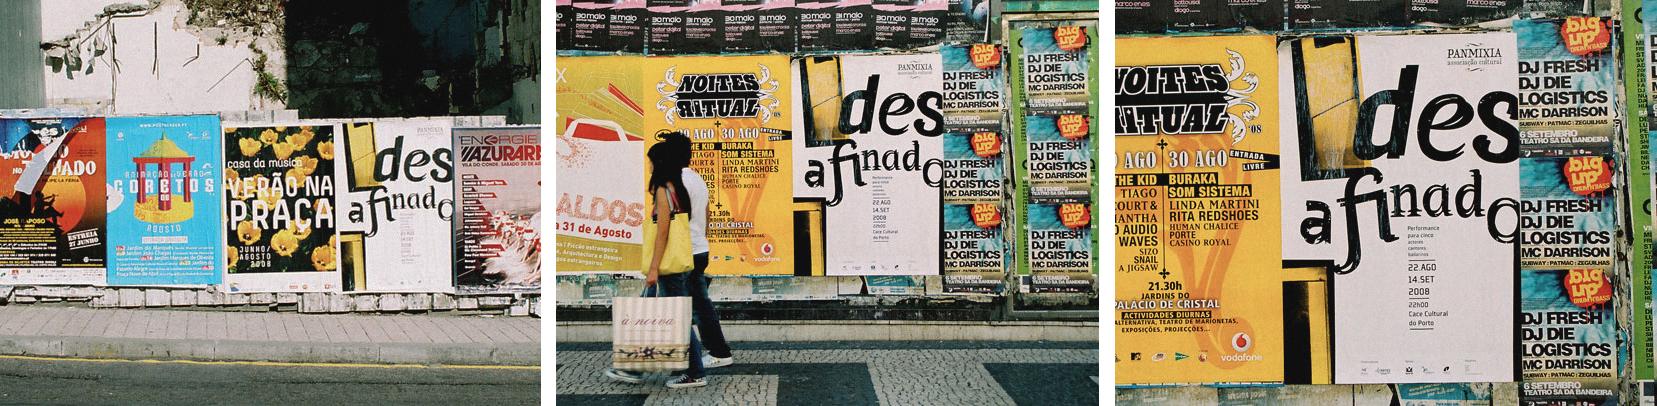 Design-Grafico-Graphic-Design-Cartaz-Poster-Mupi-Theatre-Play-Handmade-Typography-Tipografia-bonjourmolotov.jpg